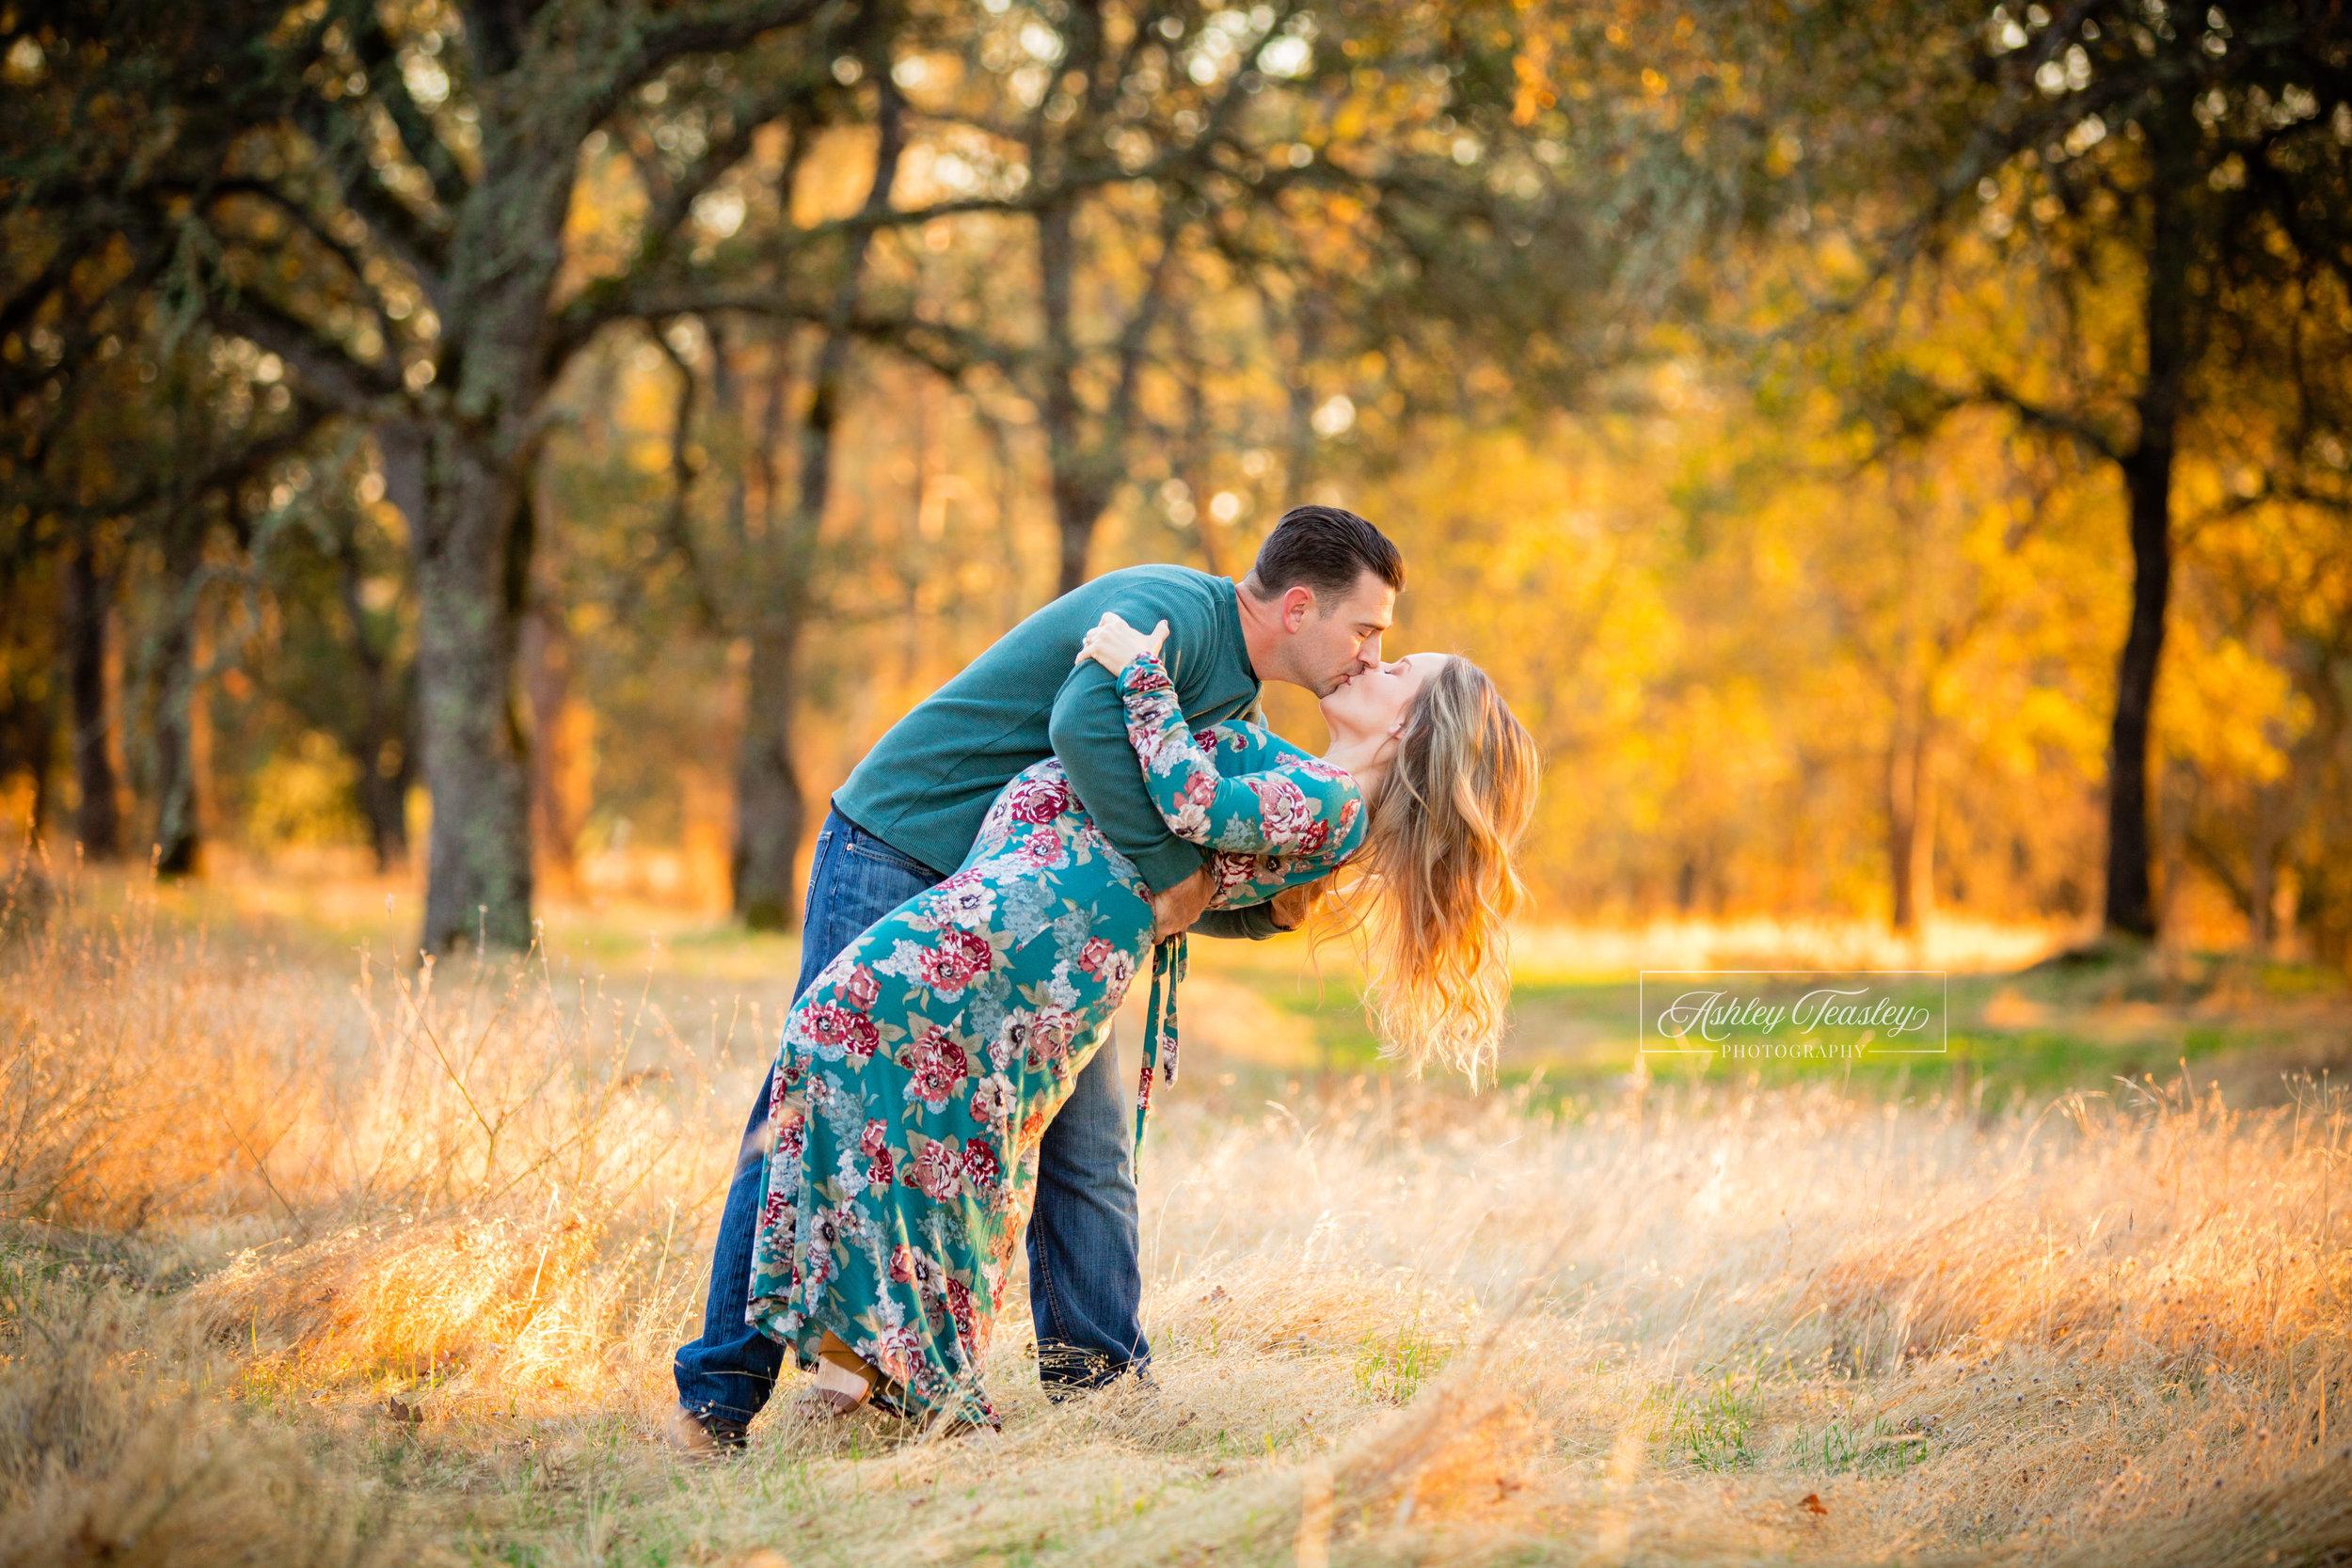 Family Session - Maternity Session - Sacramento Wedding Photographer - Ashley Teasley Photography-2.jpg